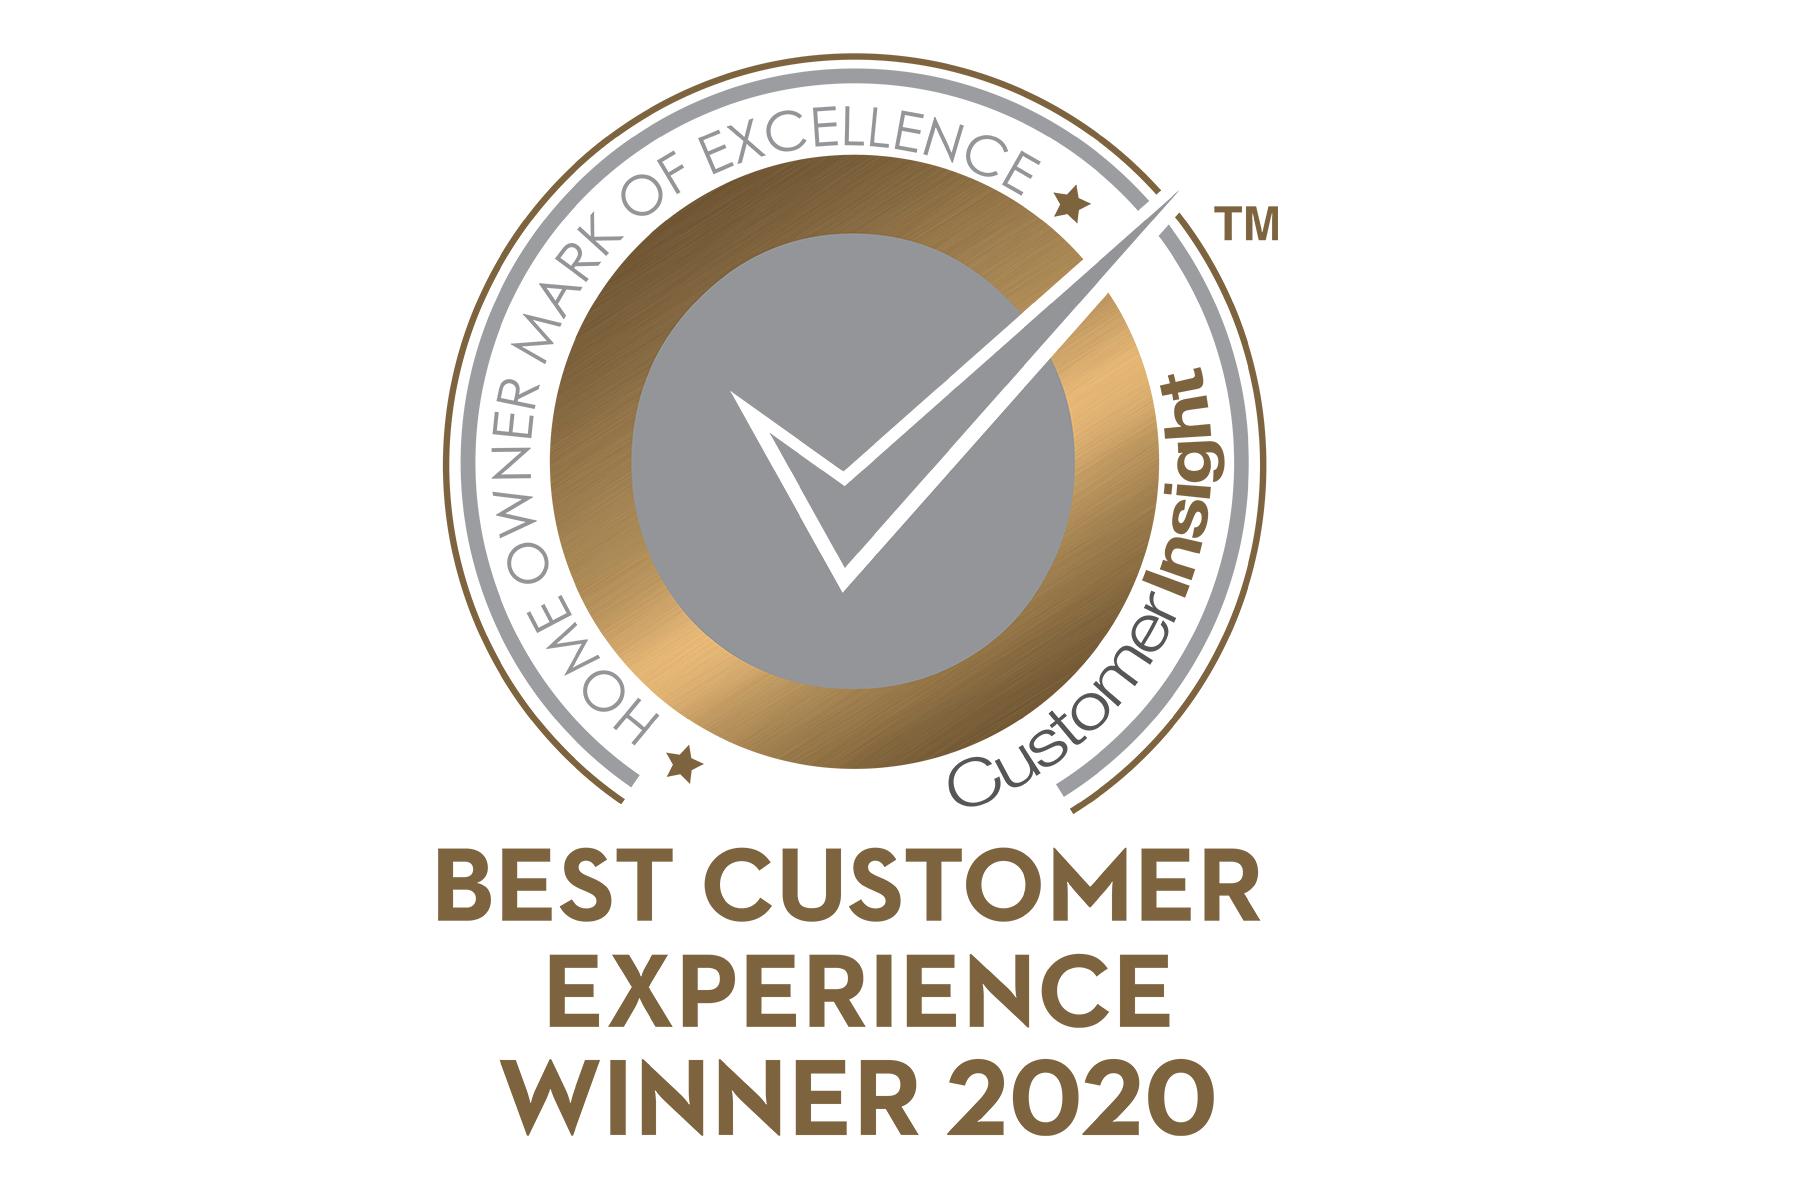 2020 CustomerInsight H.O.M.E Best Customer Experience